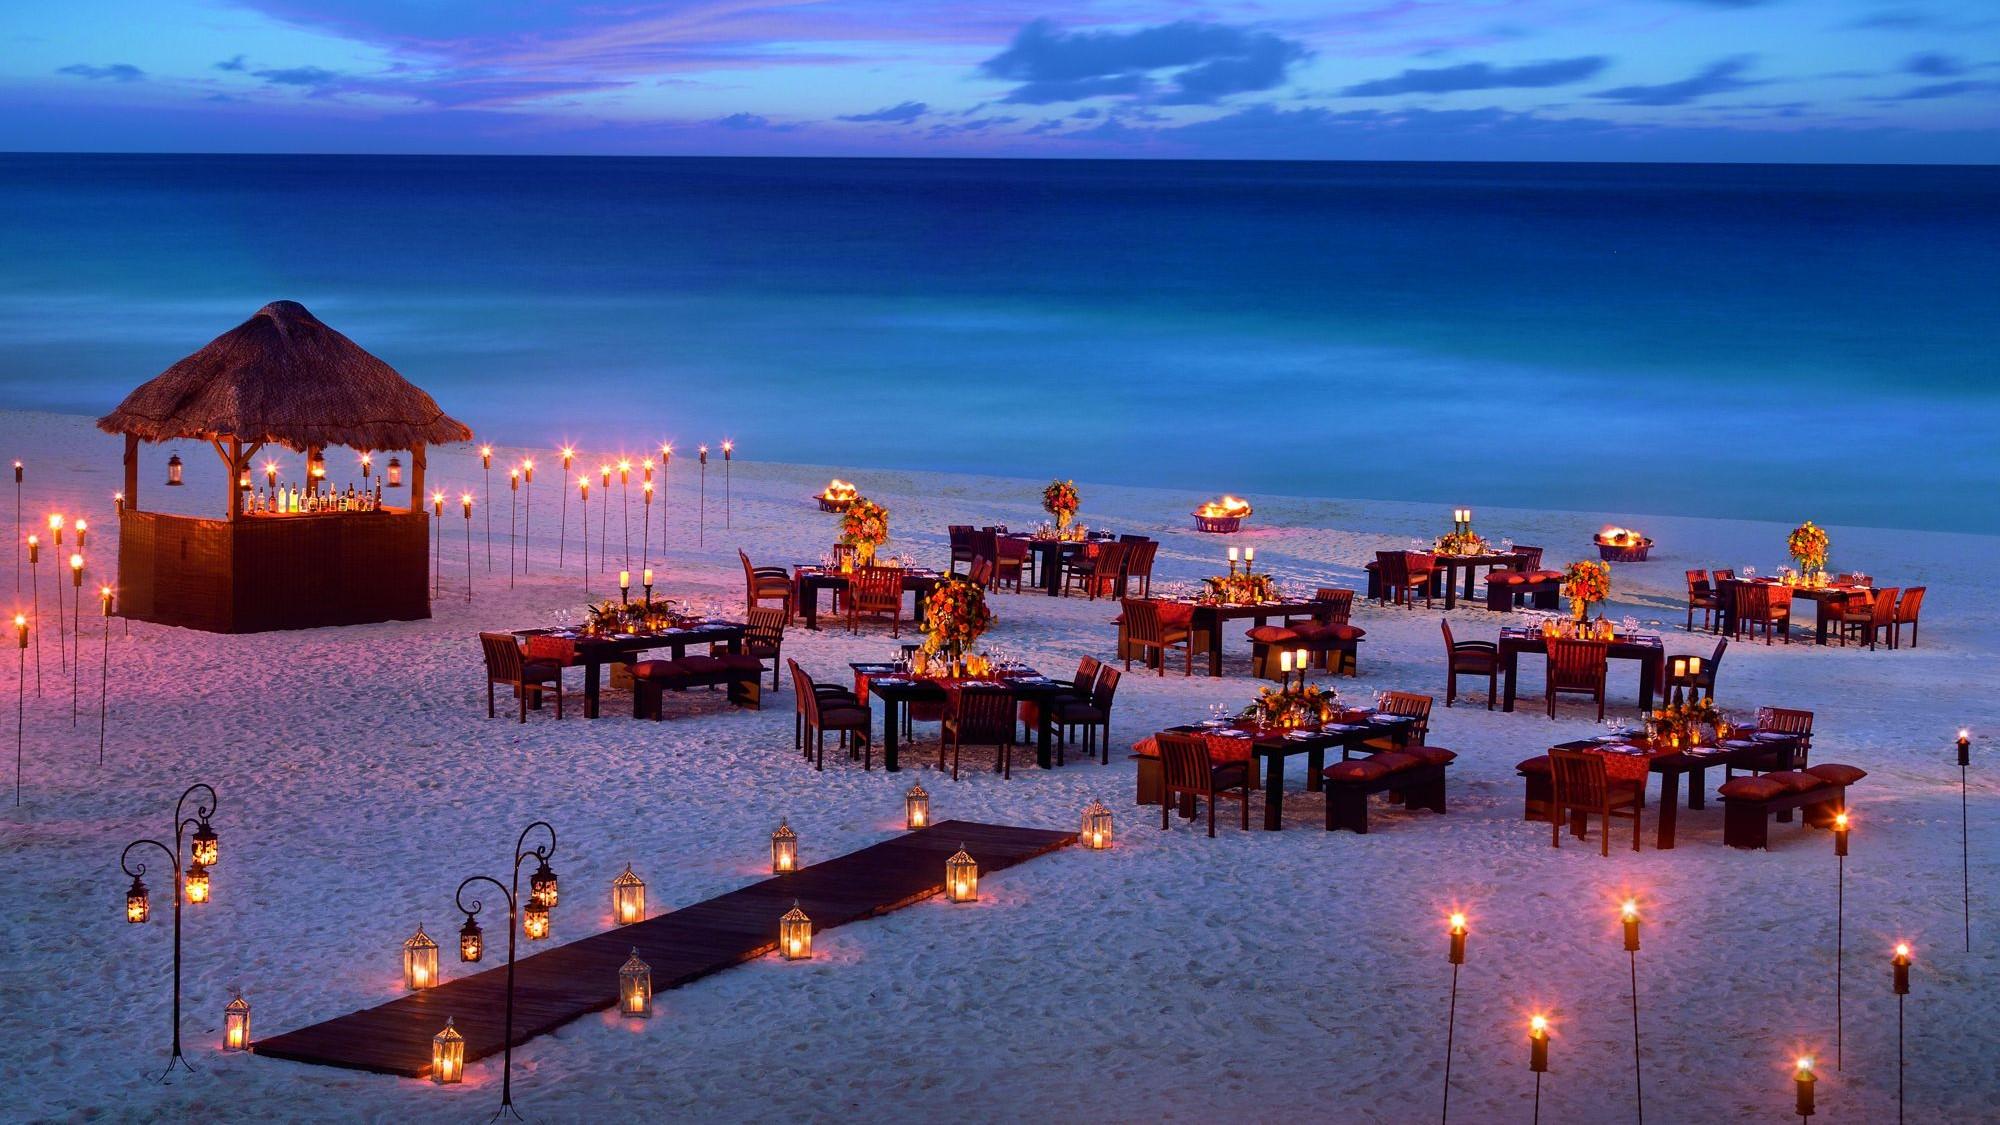 Beach Receptions Indian Destination Wedding Cancun Dreams AM Resorts.jpg